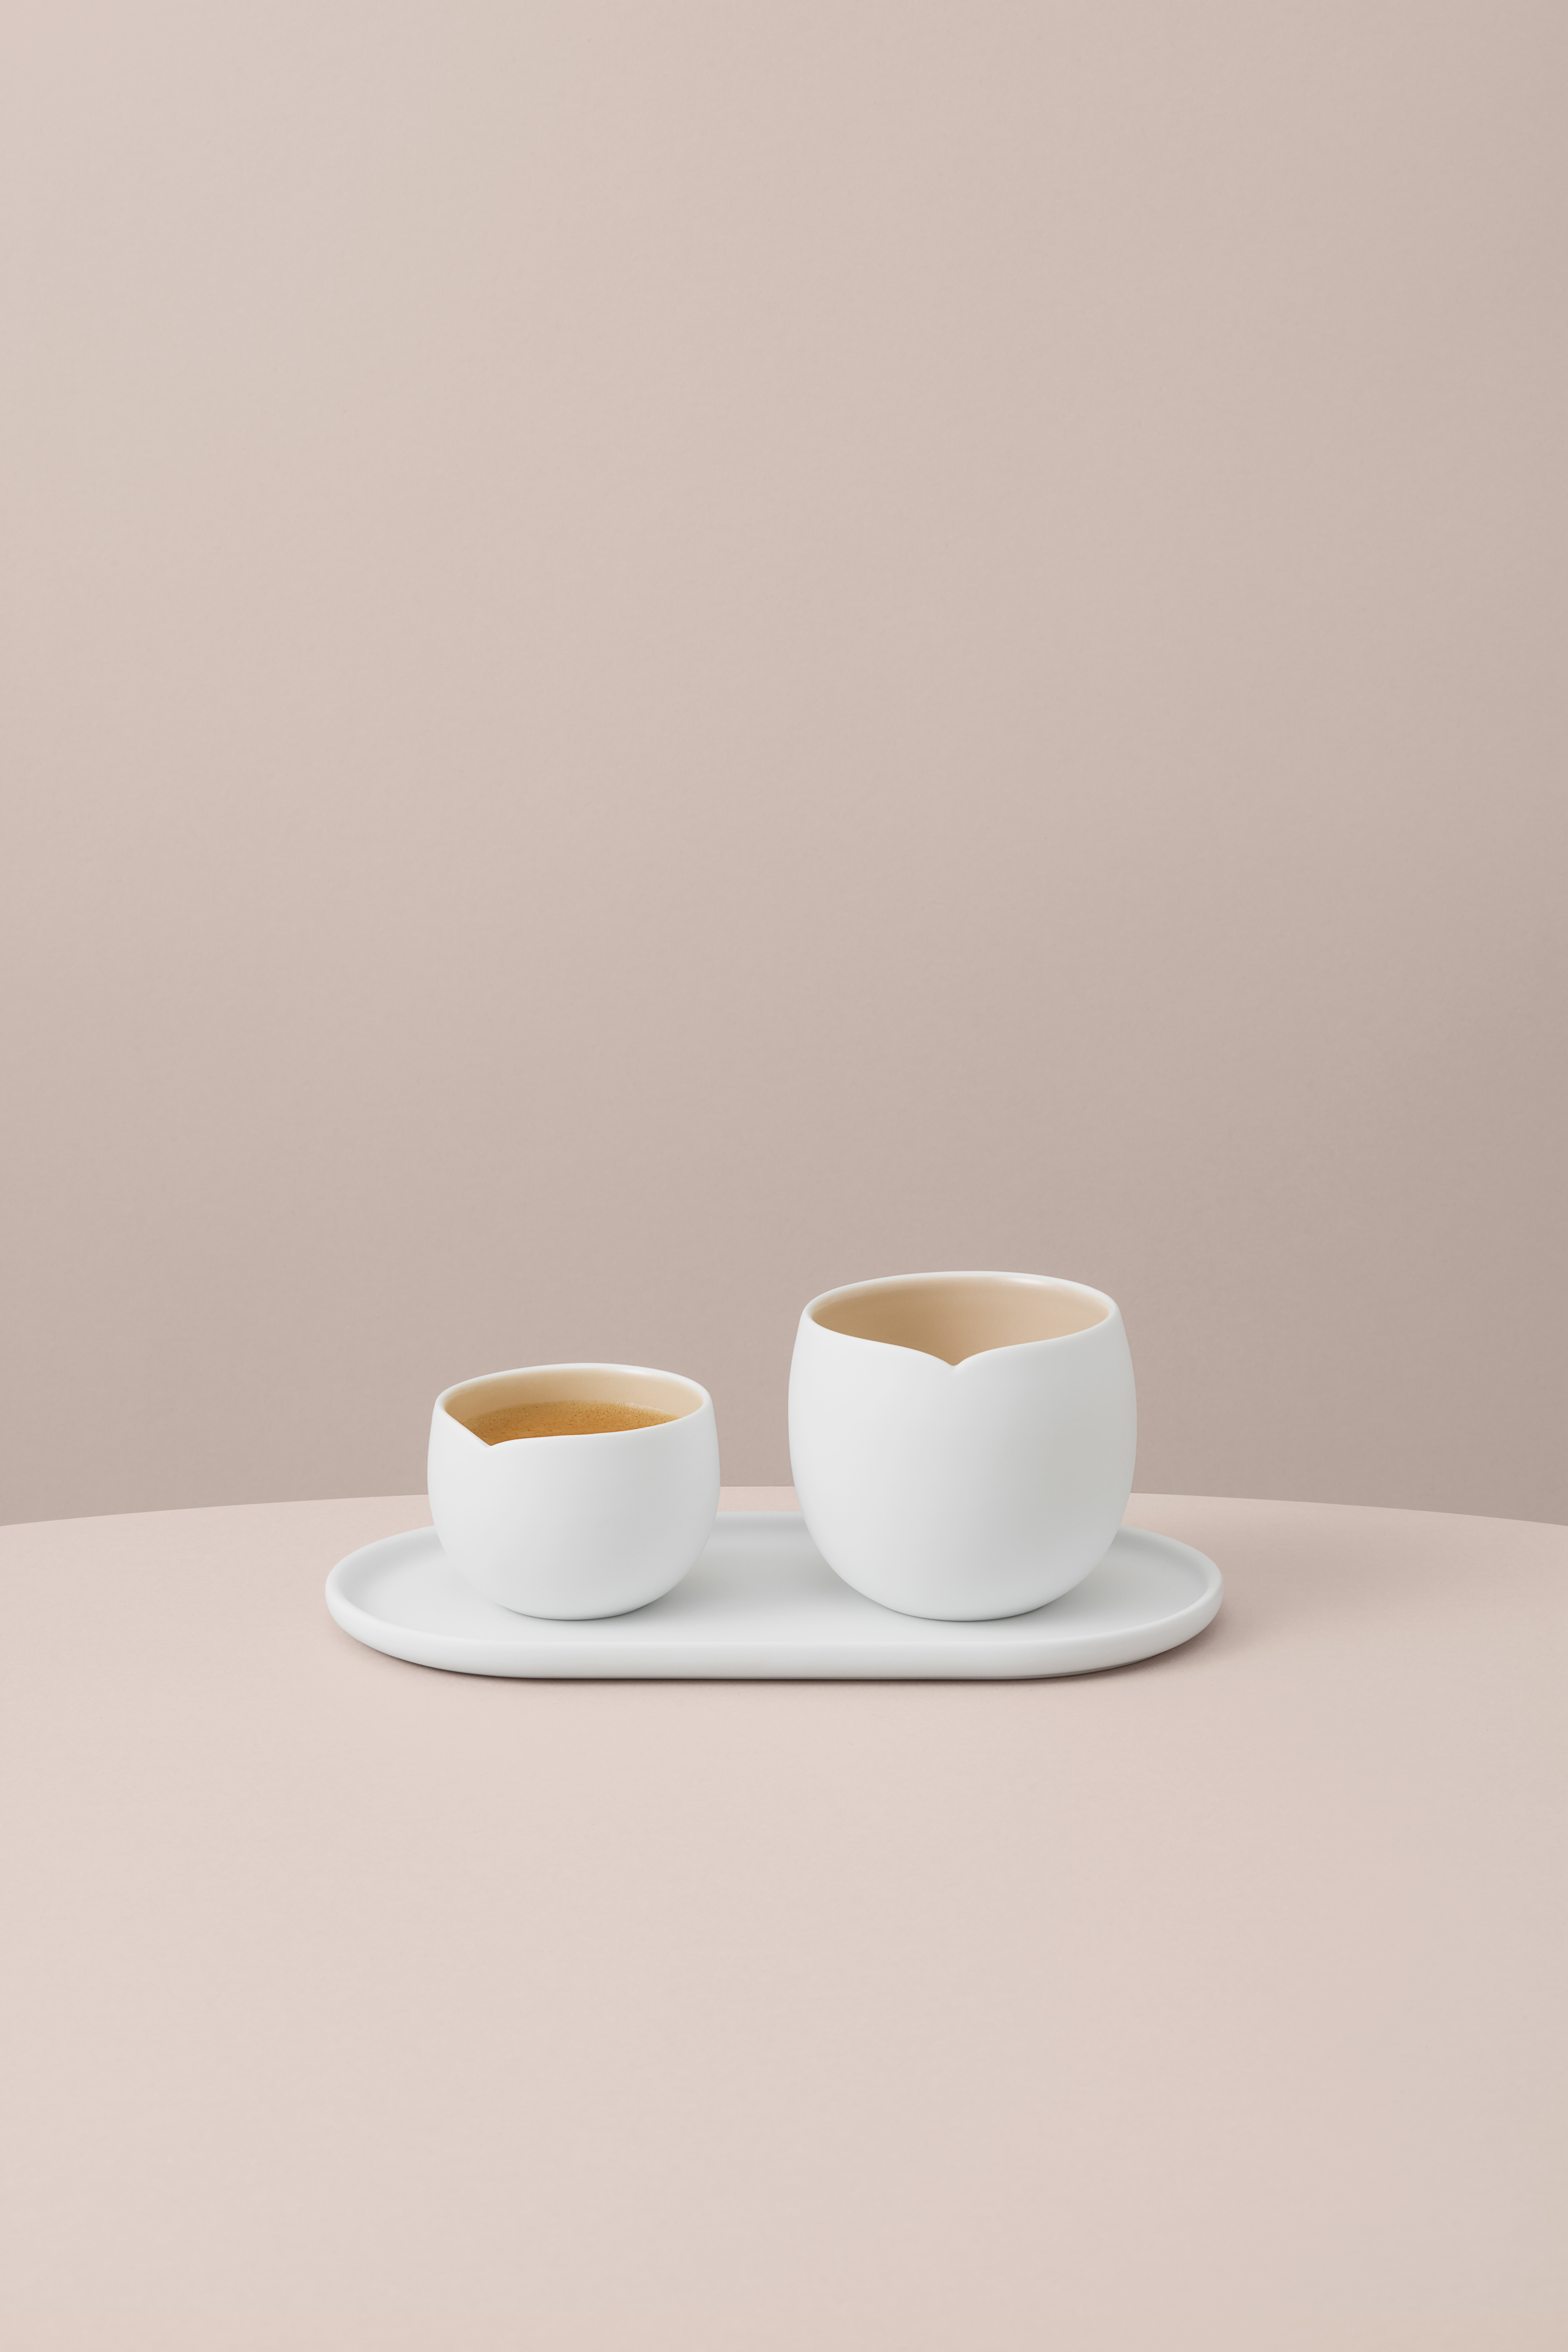 Nespresso - India Mahdavi